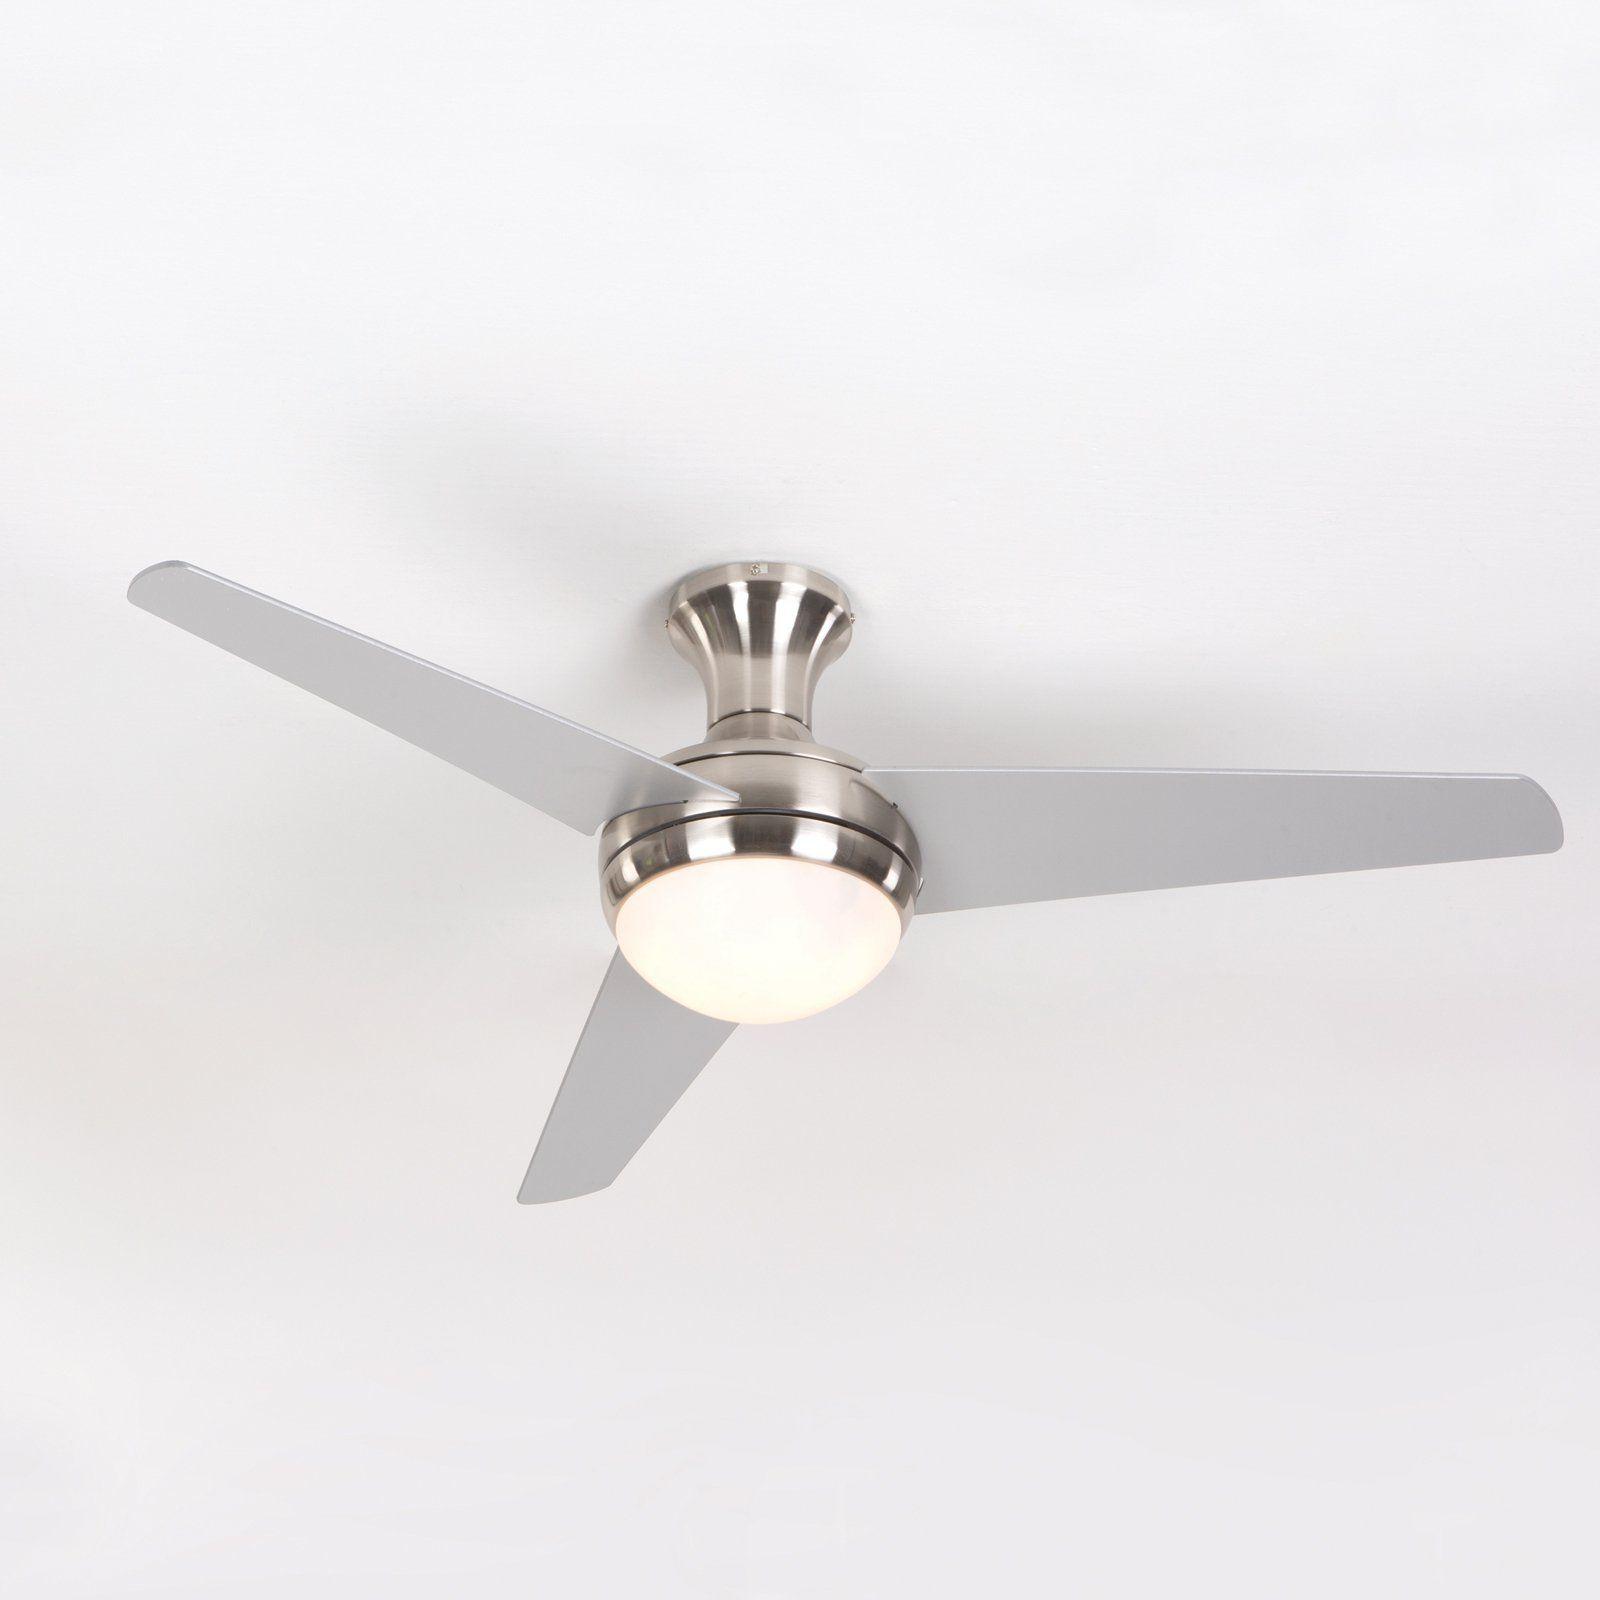 Yosemite home decor adalyn 48 in indoor ceiling fan with